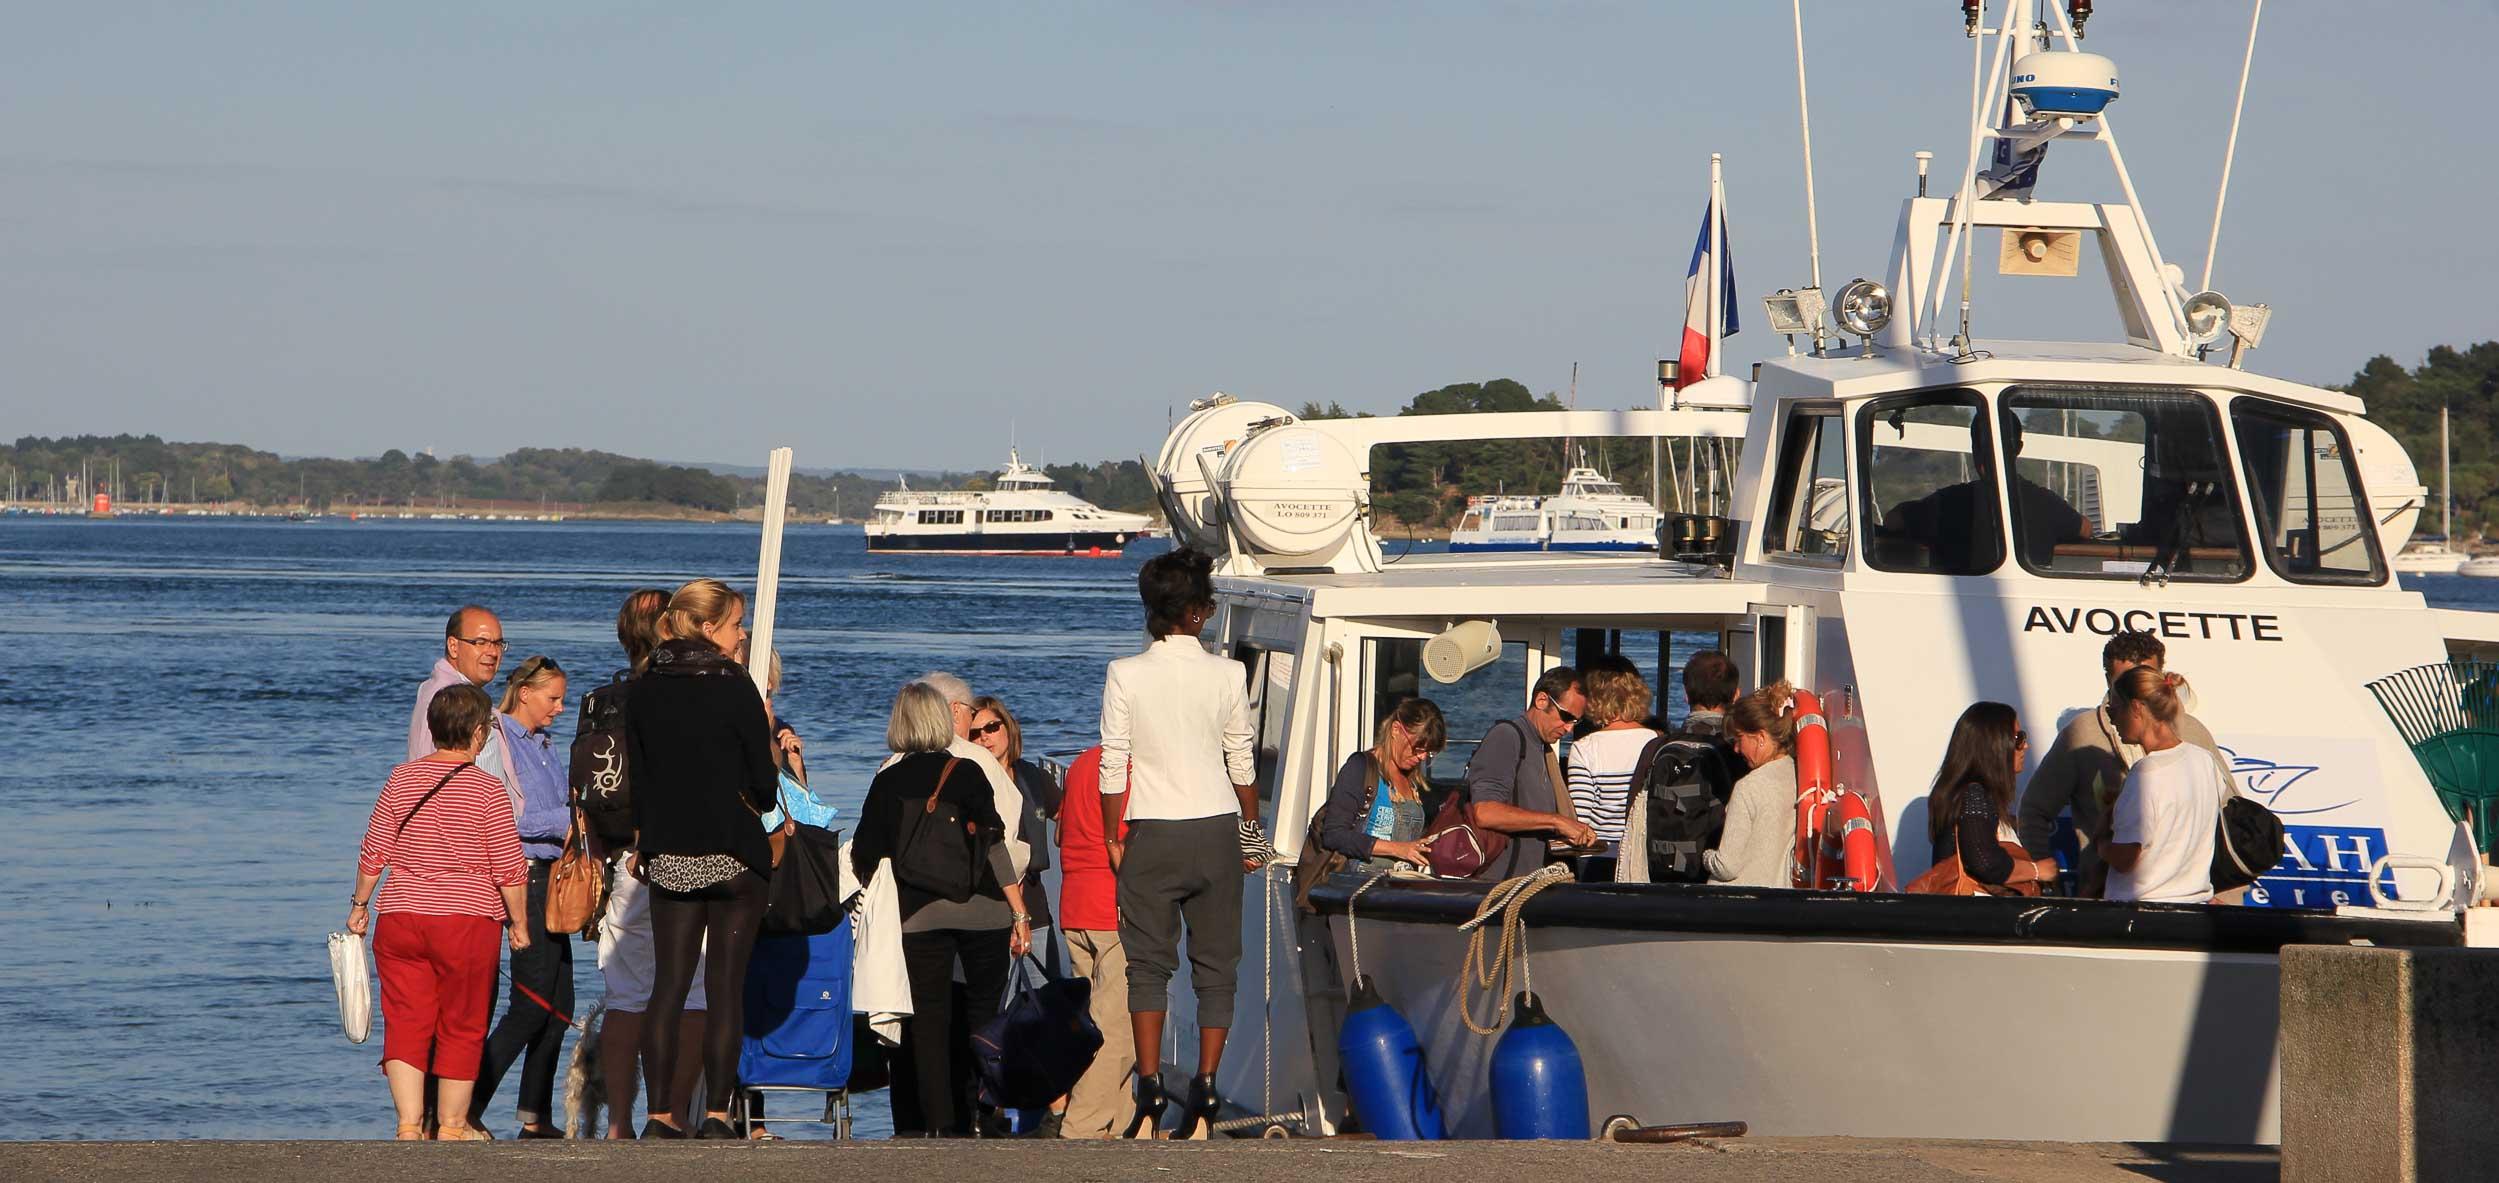 Escapade dans le Golfe du Morbihan #4